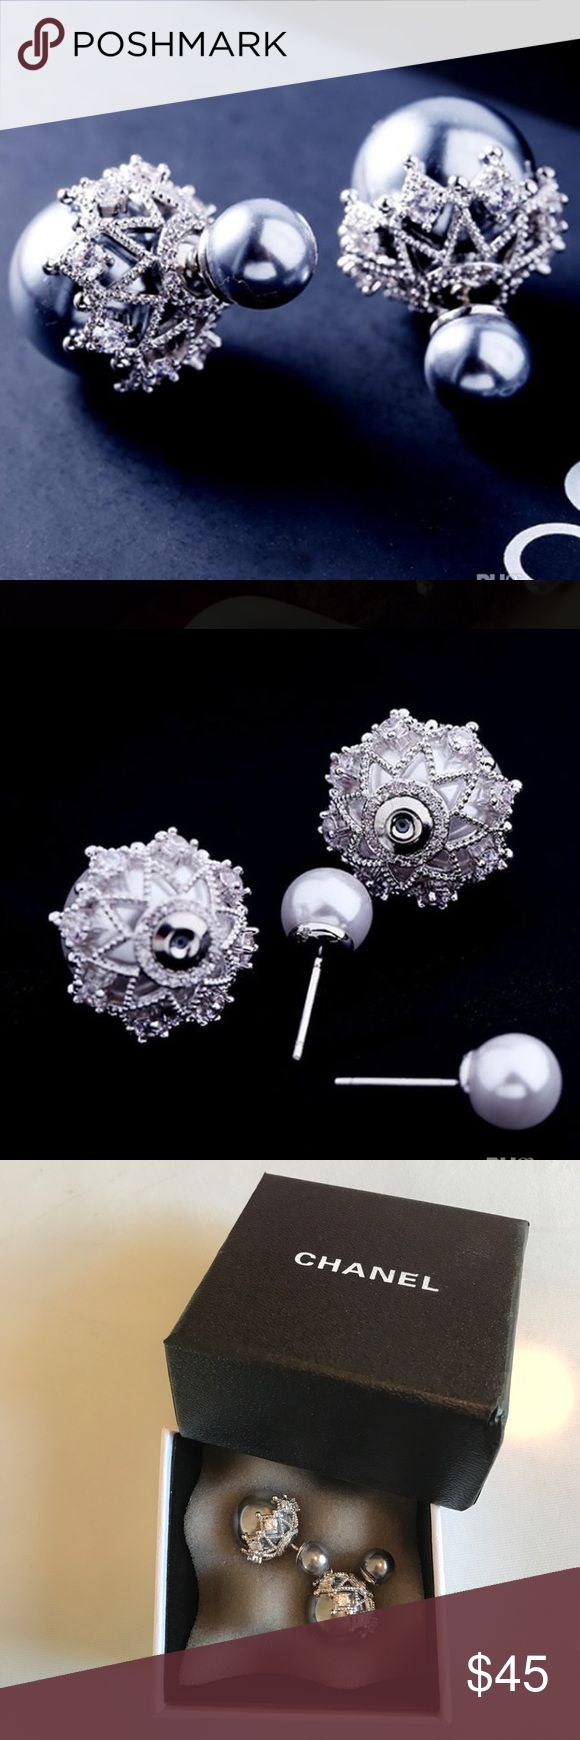 Dior tribal pearl style diamond earrings new very pretty earrings in chanel box very high quality no box dior jewelry earrings